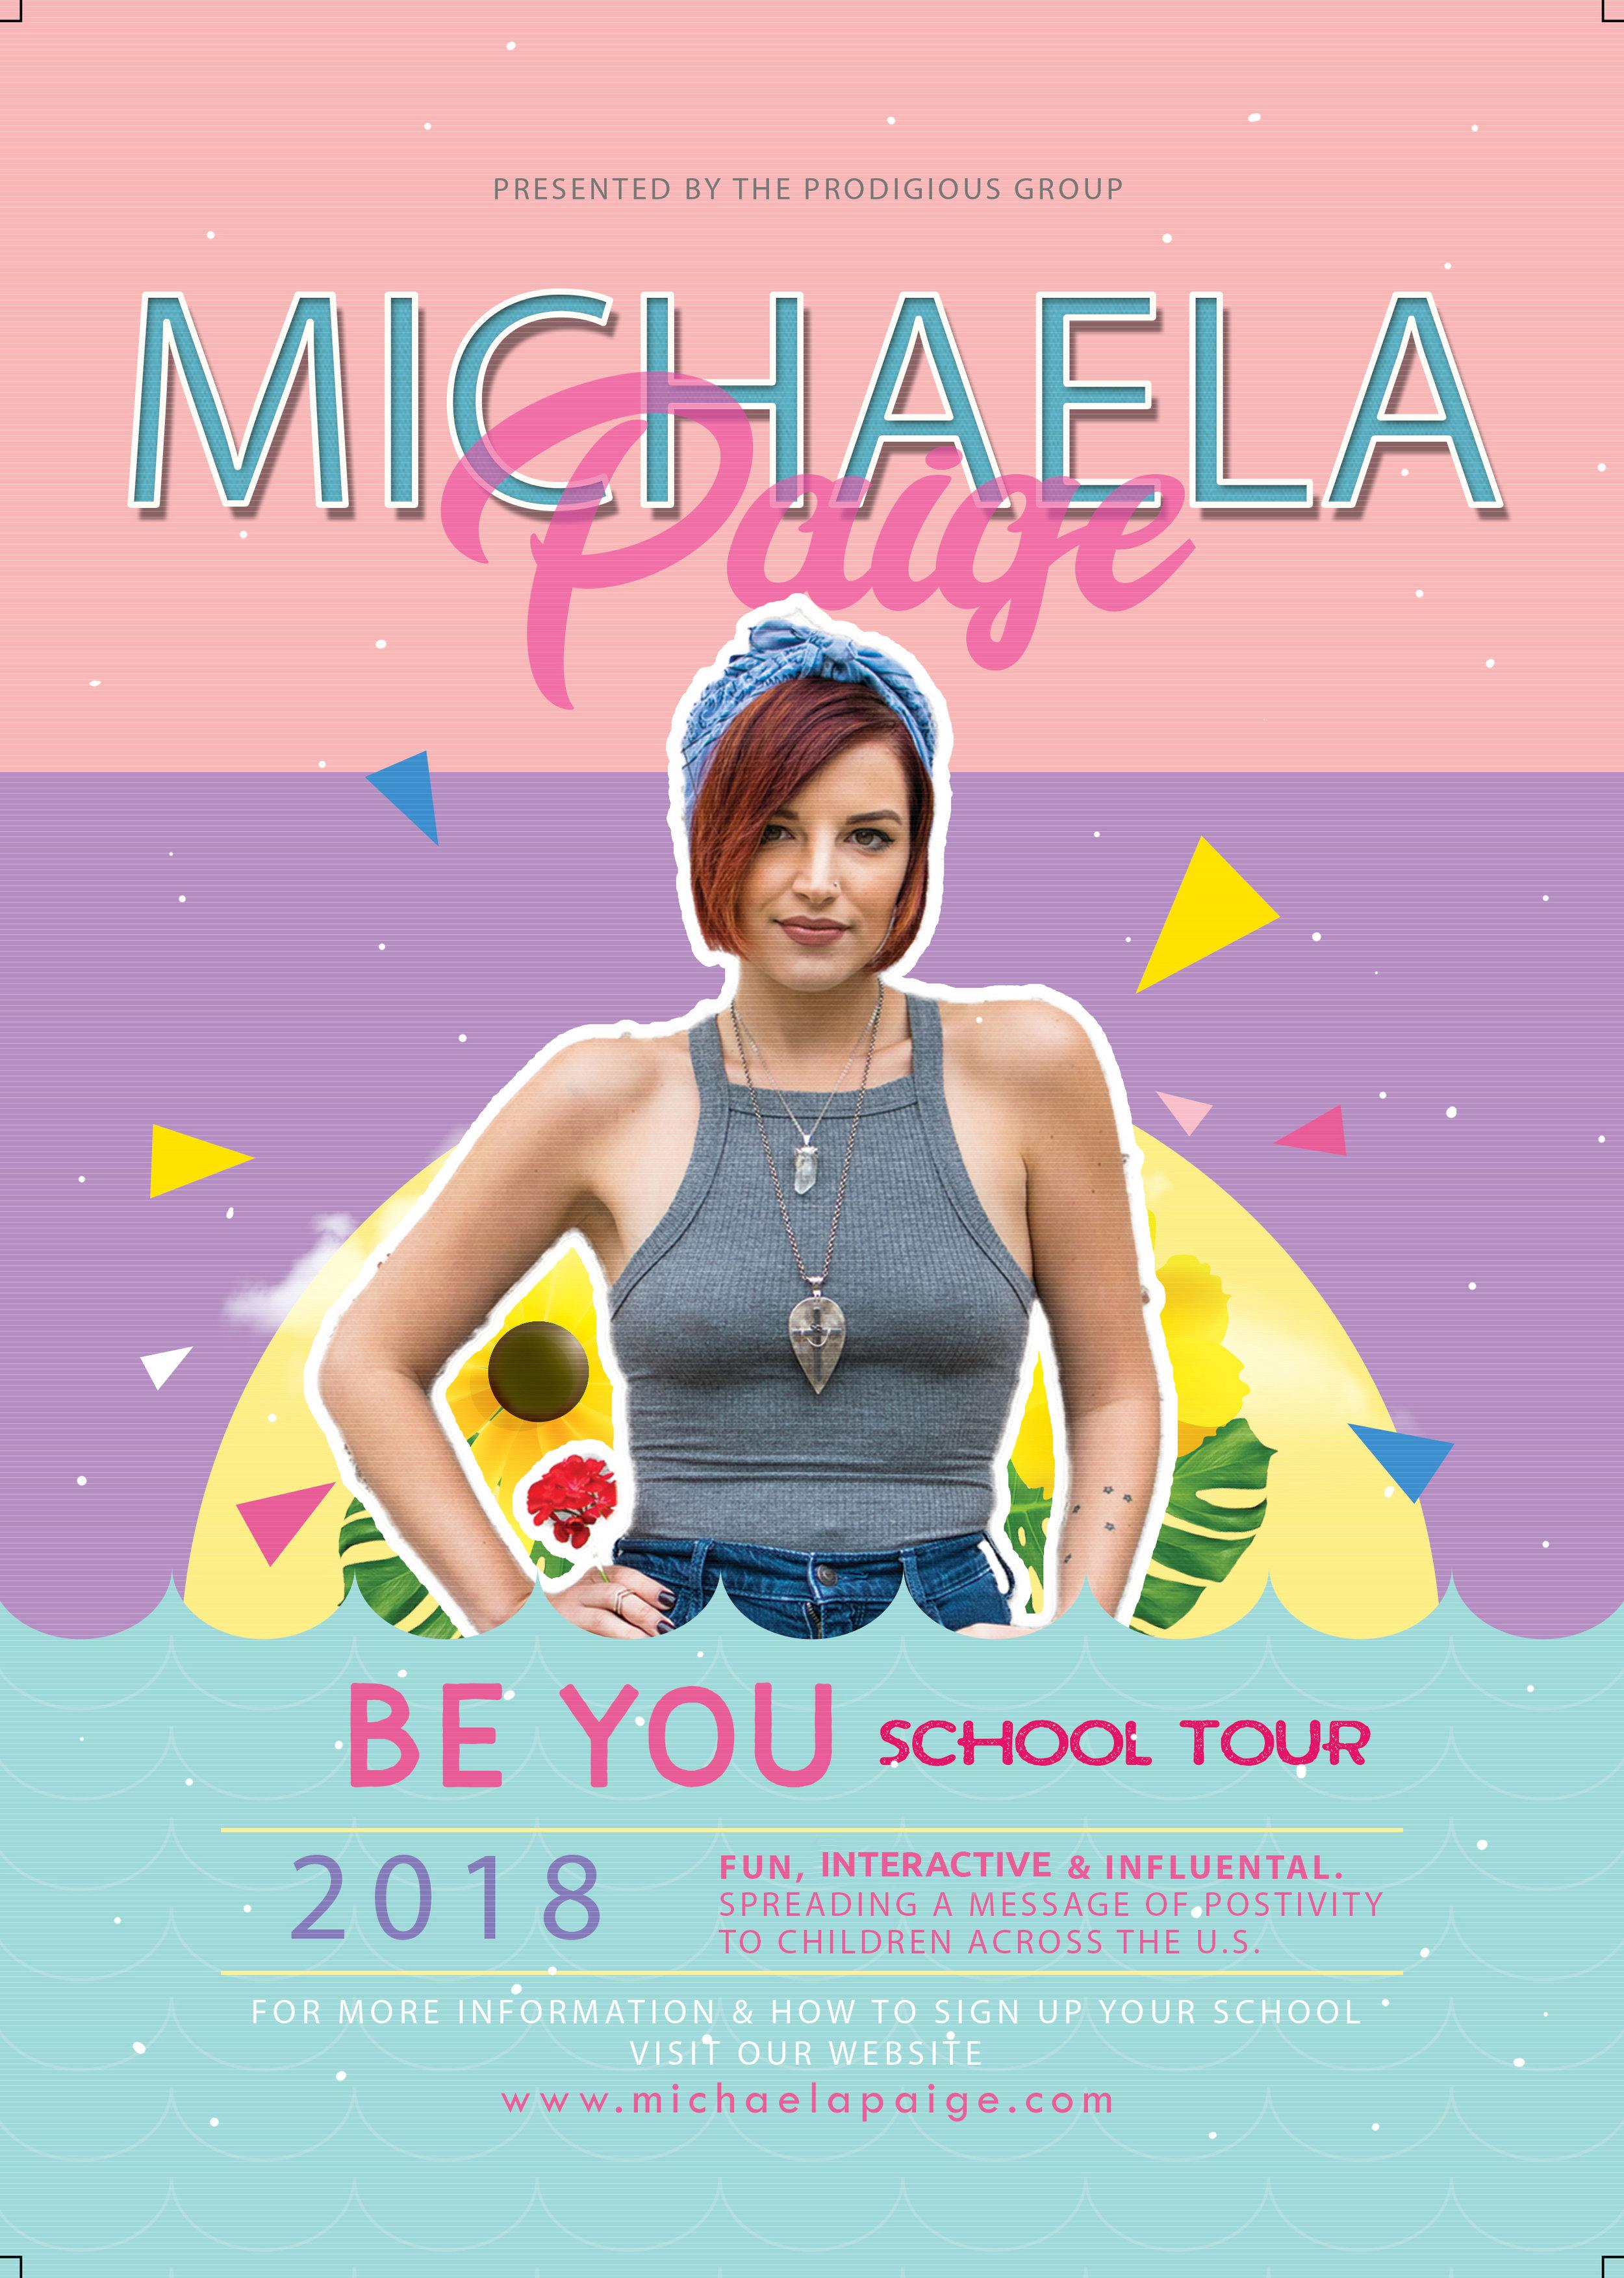 Michaela Paige PostCard copy.jpg